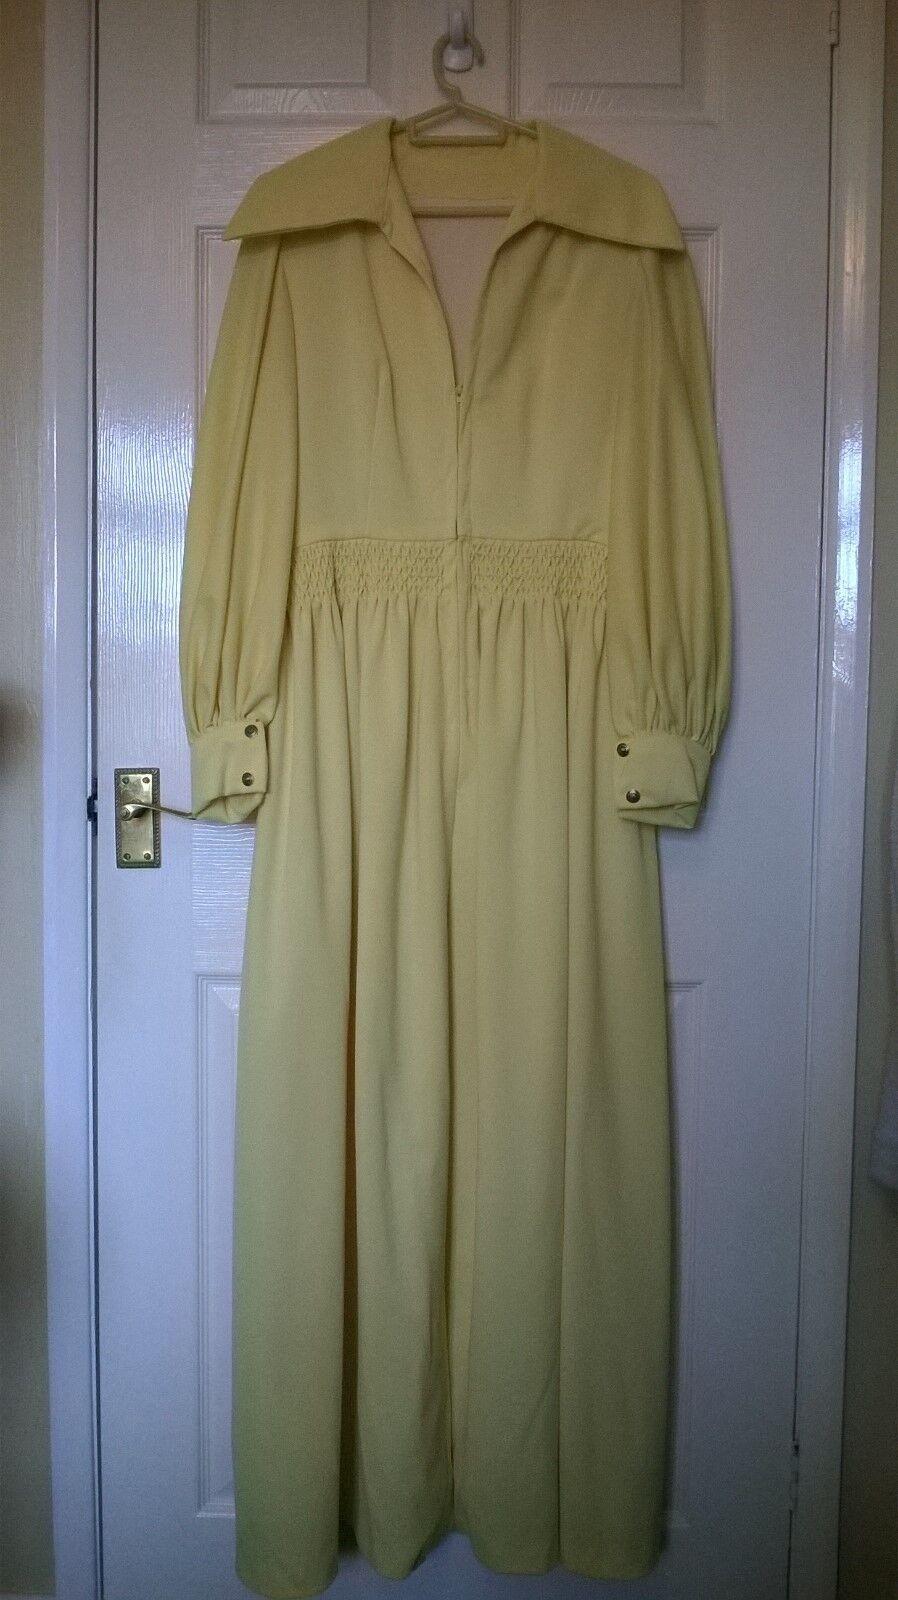 Vintage Ladies long evening dress, plain yellow